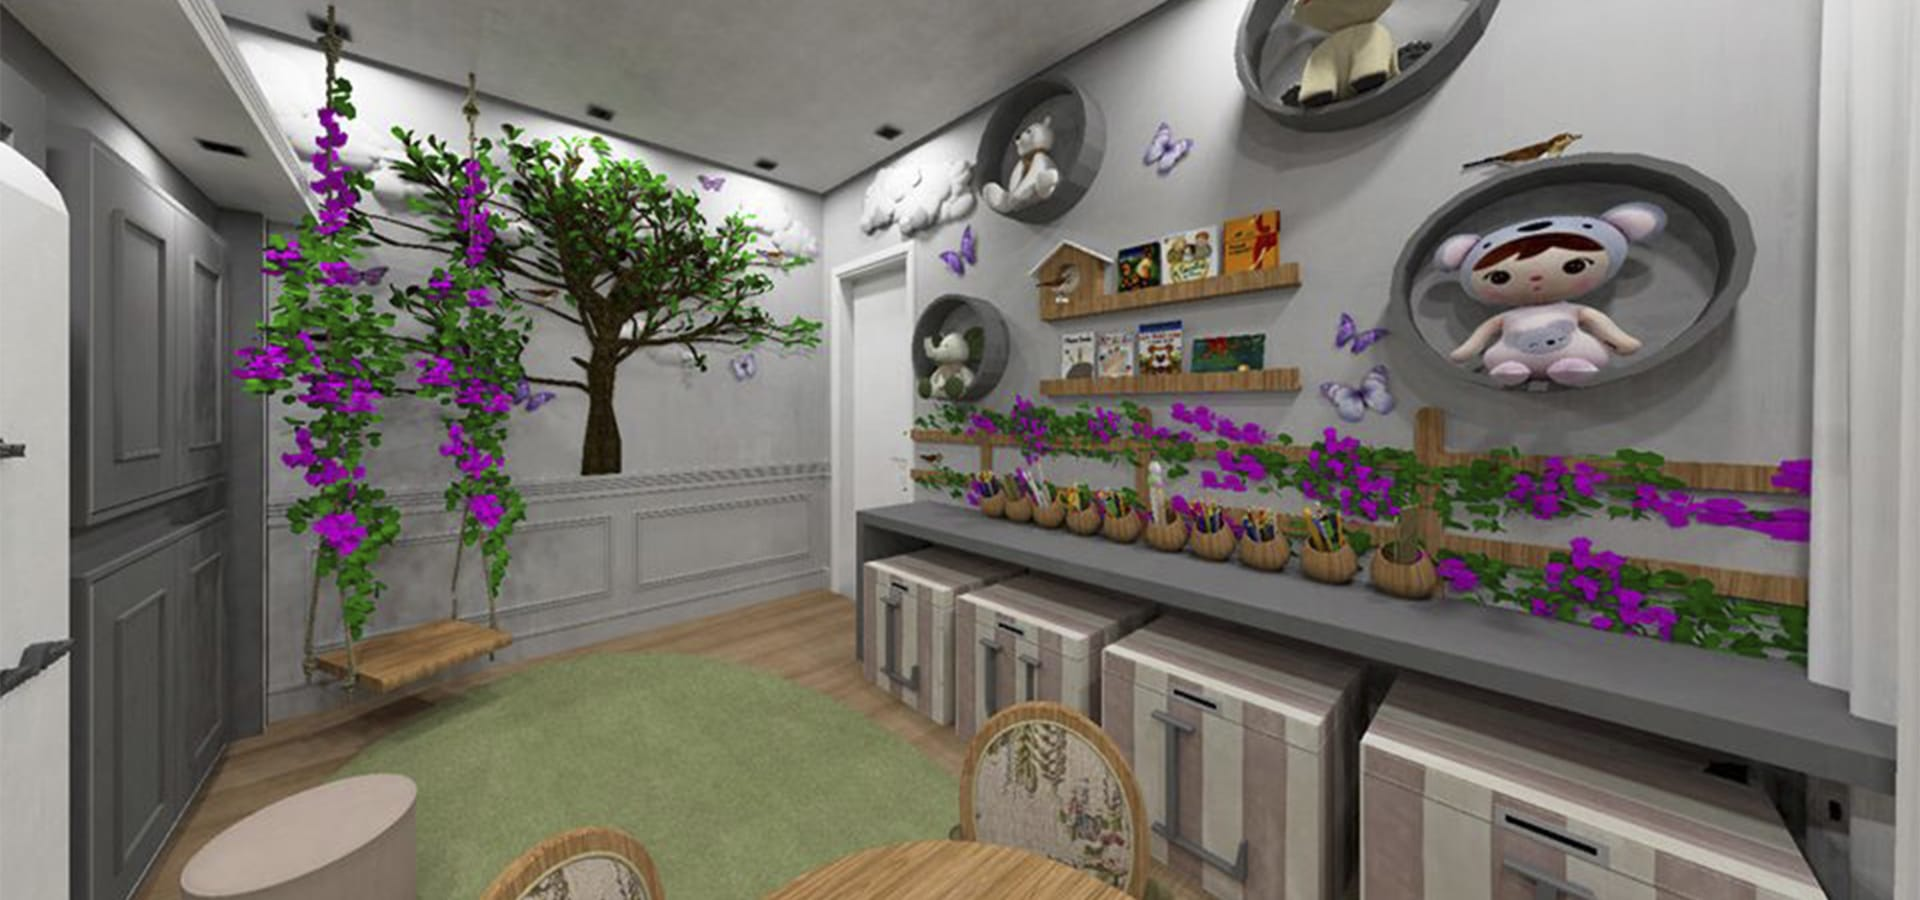 Thaissa Maziero – Interior l Design